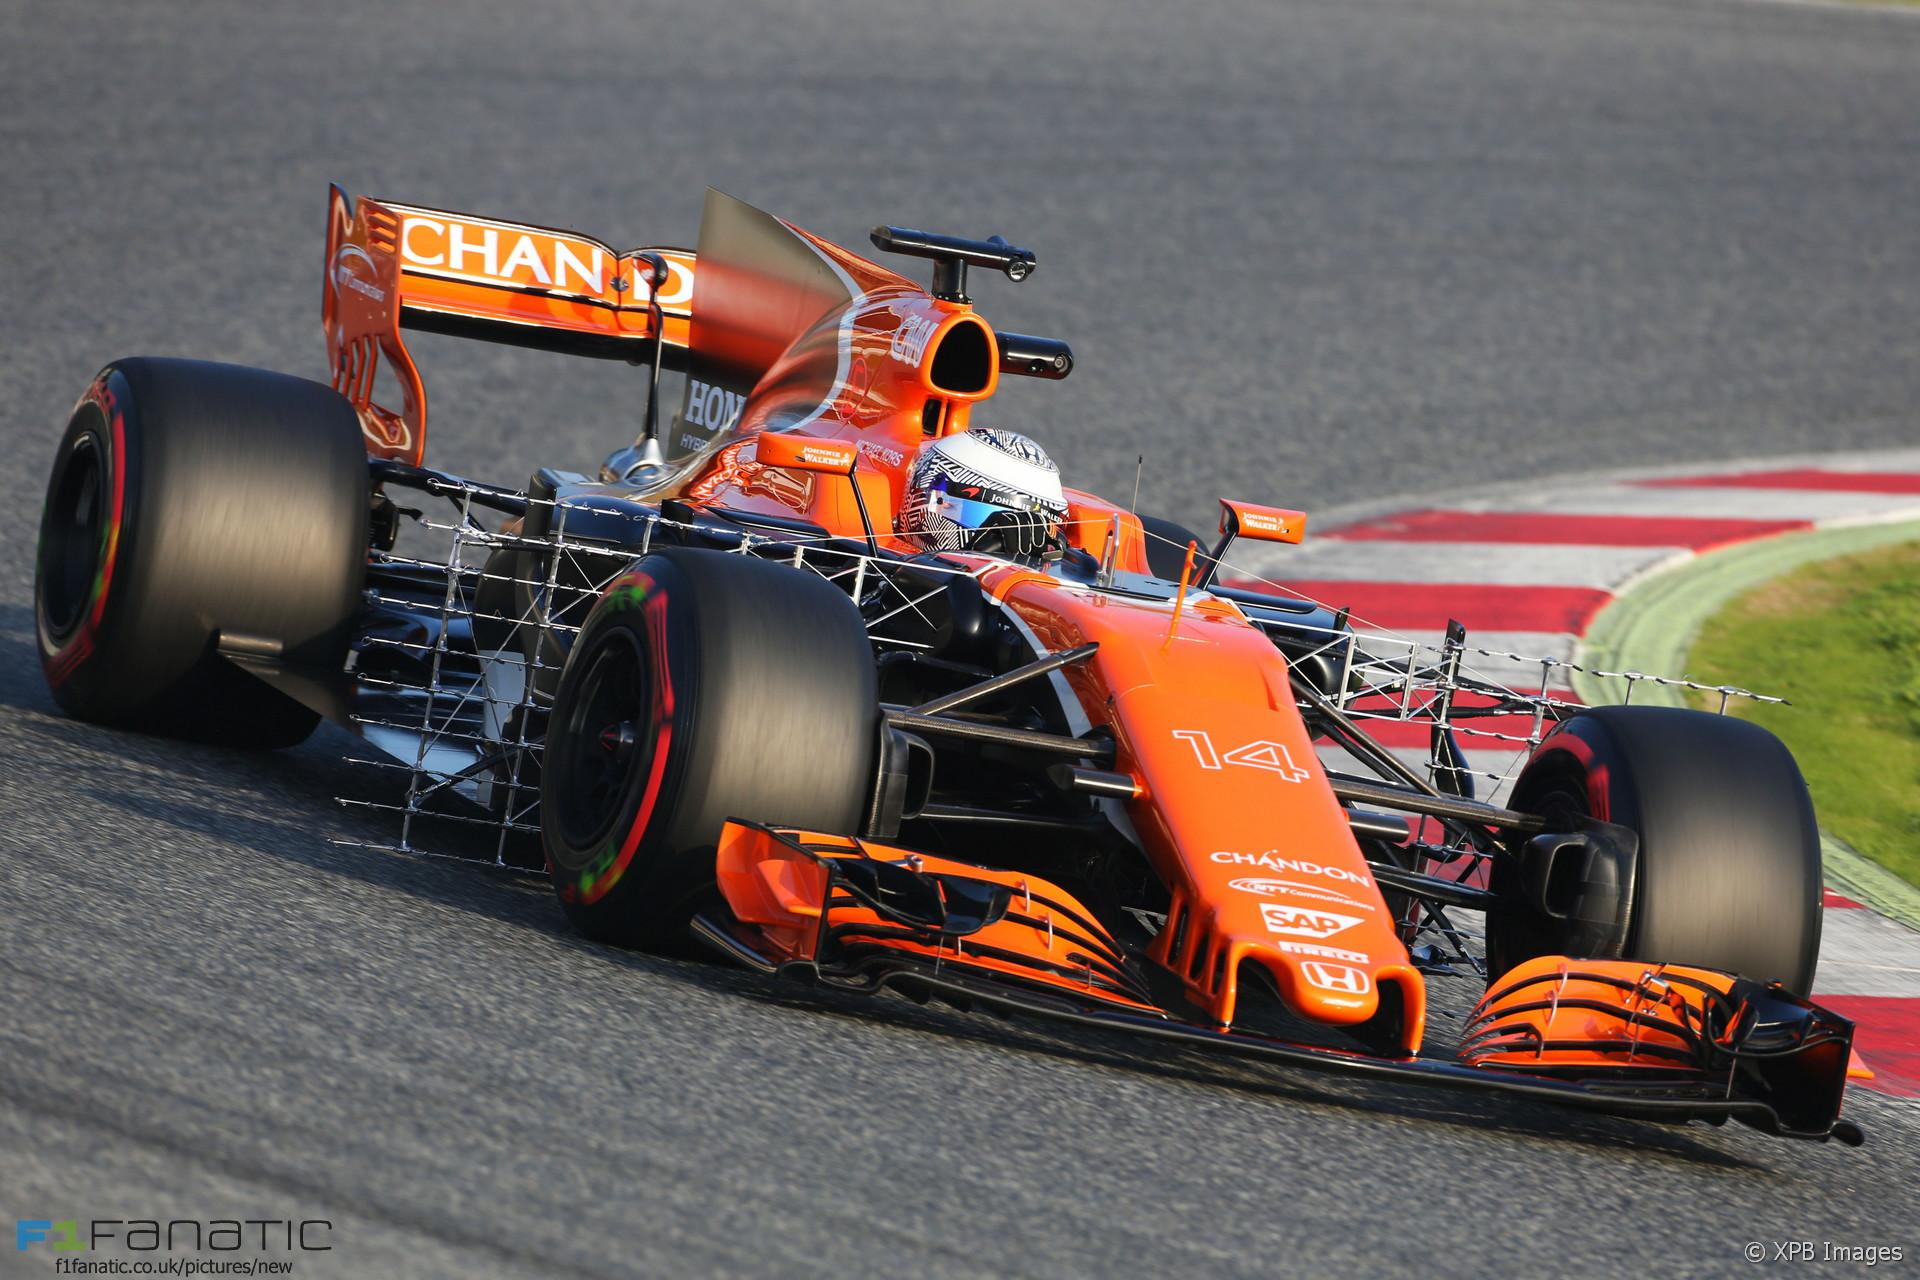 Fernando Alonso, McLaren, Circuit de Catalunya, 2017 · F1 ...